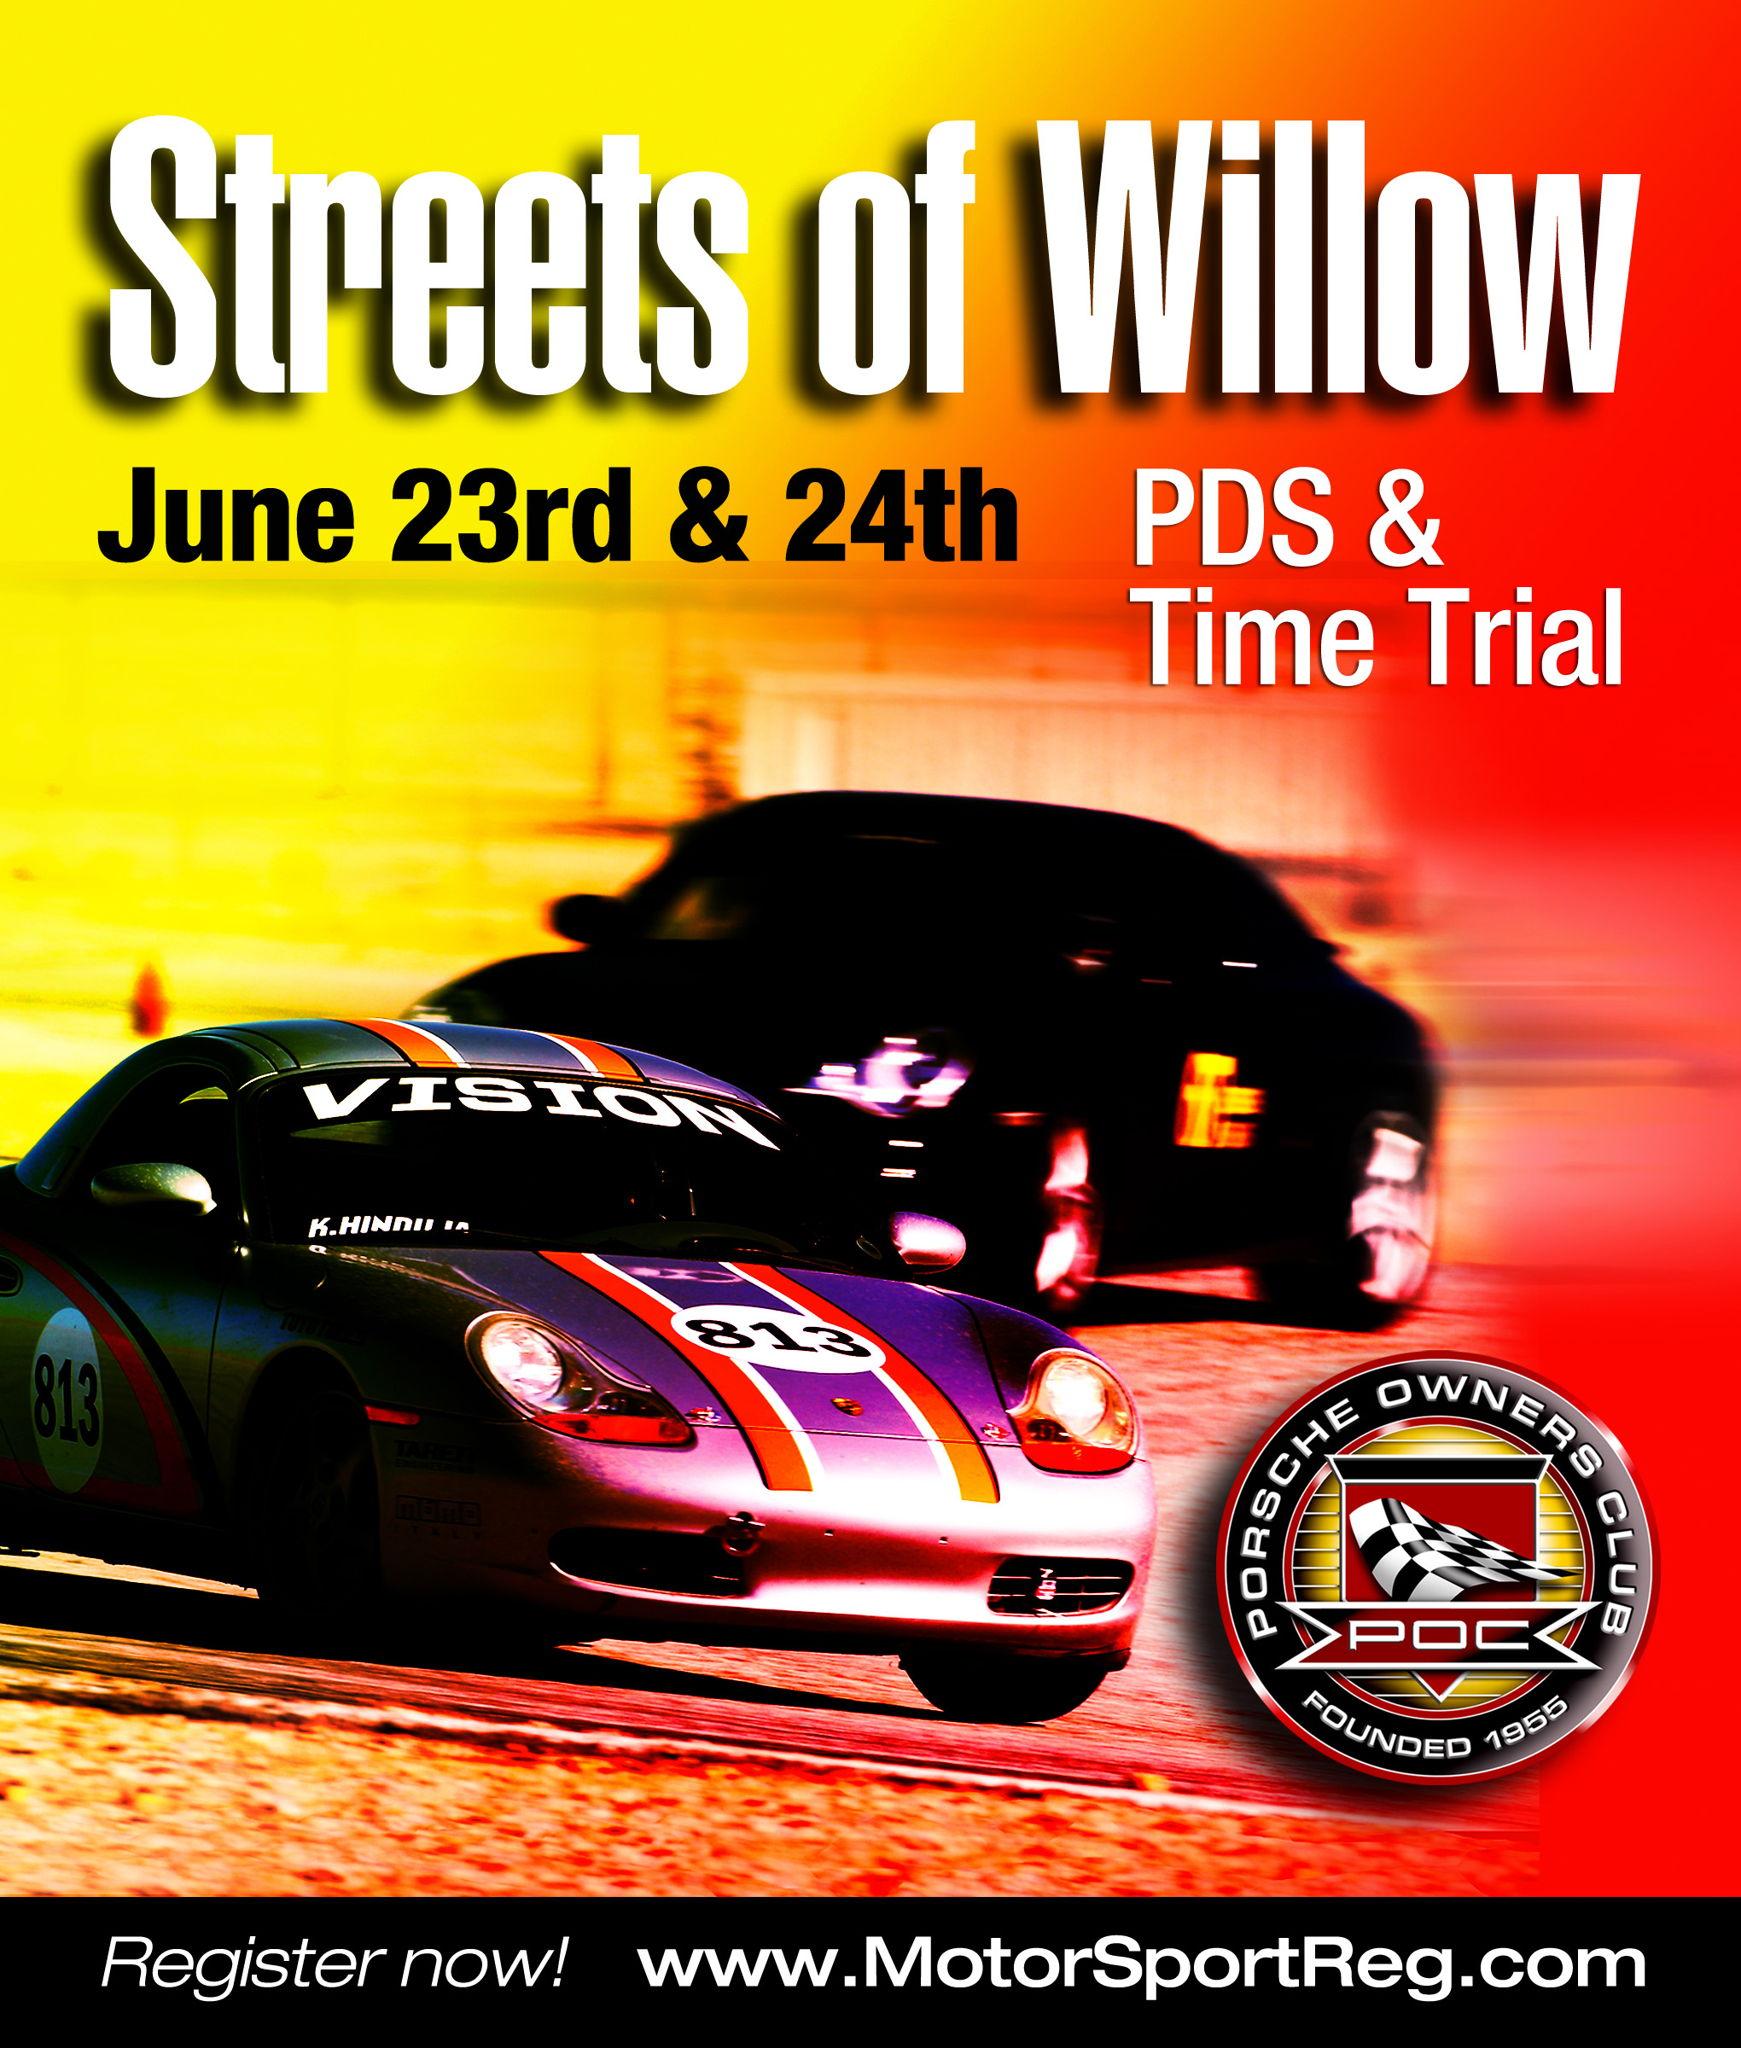 POC Streets of Willow June 23 24 2018 info on Jun 23 2018